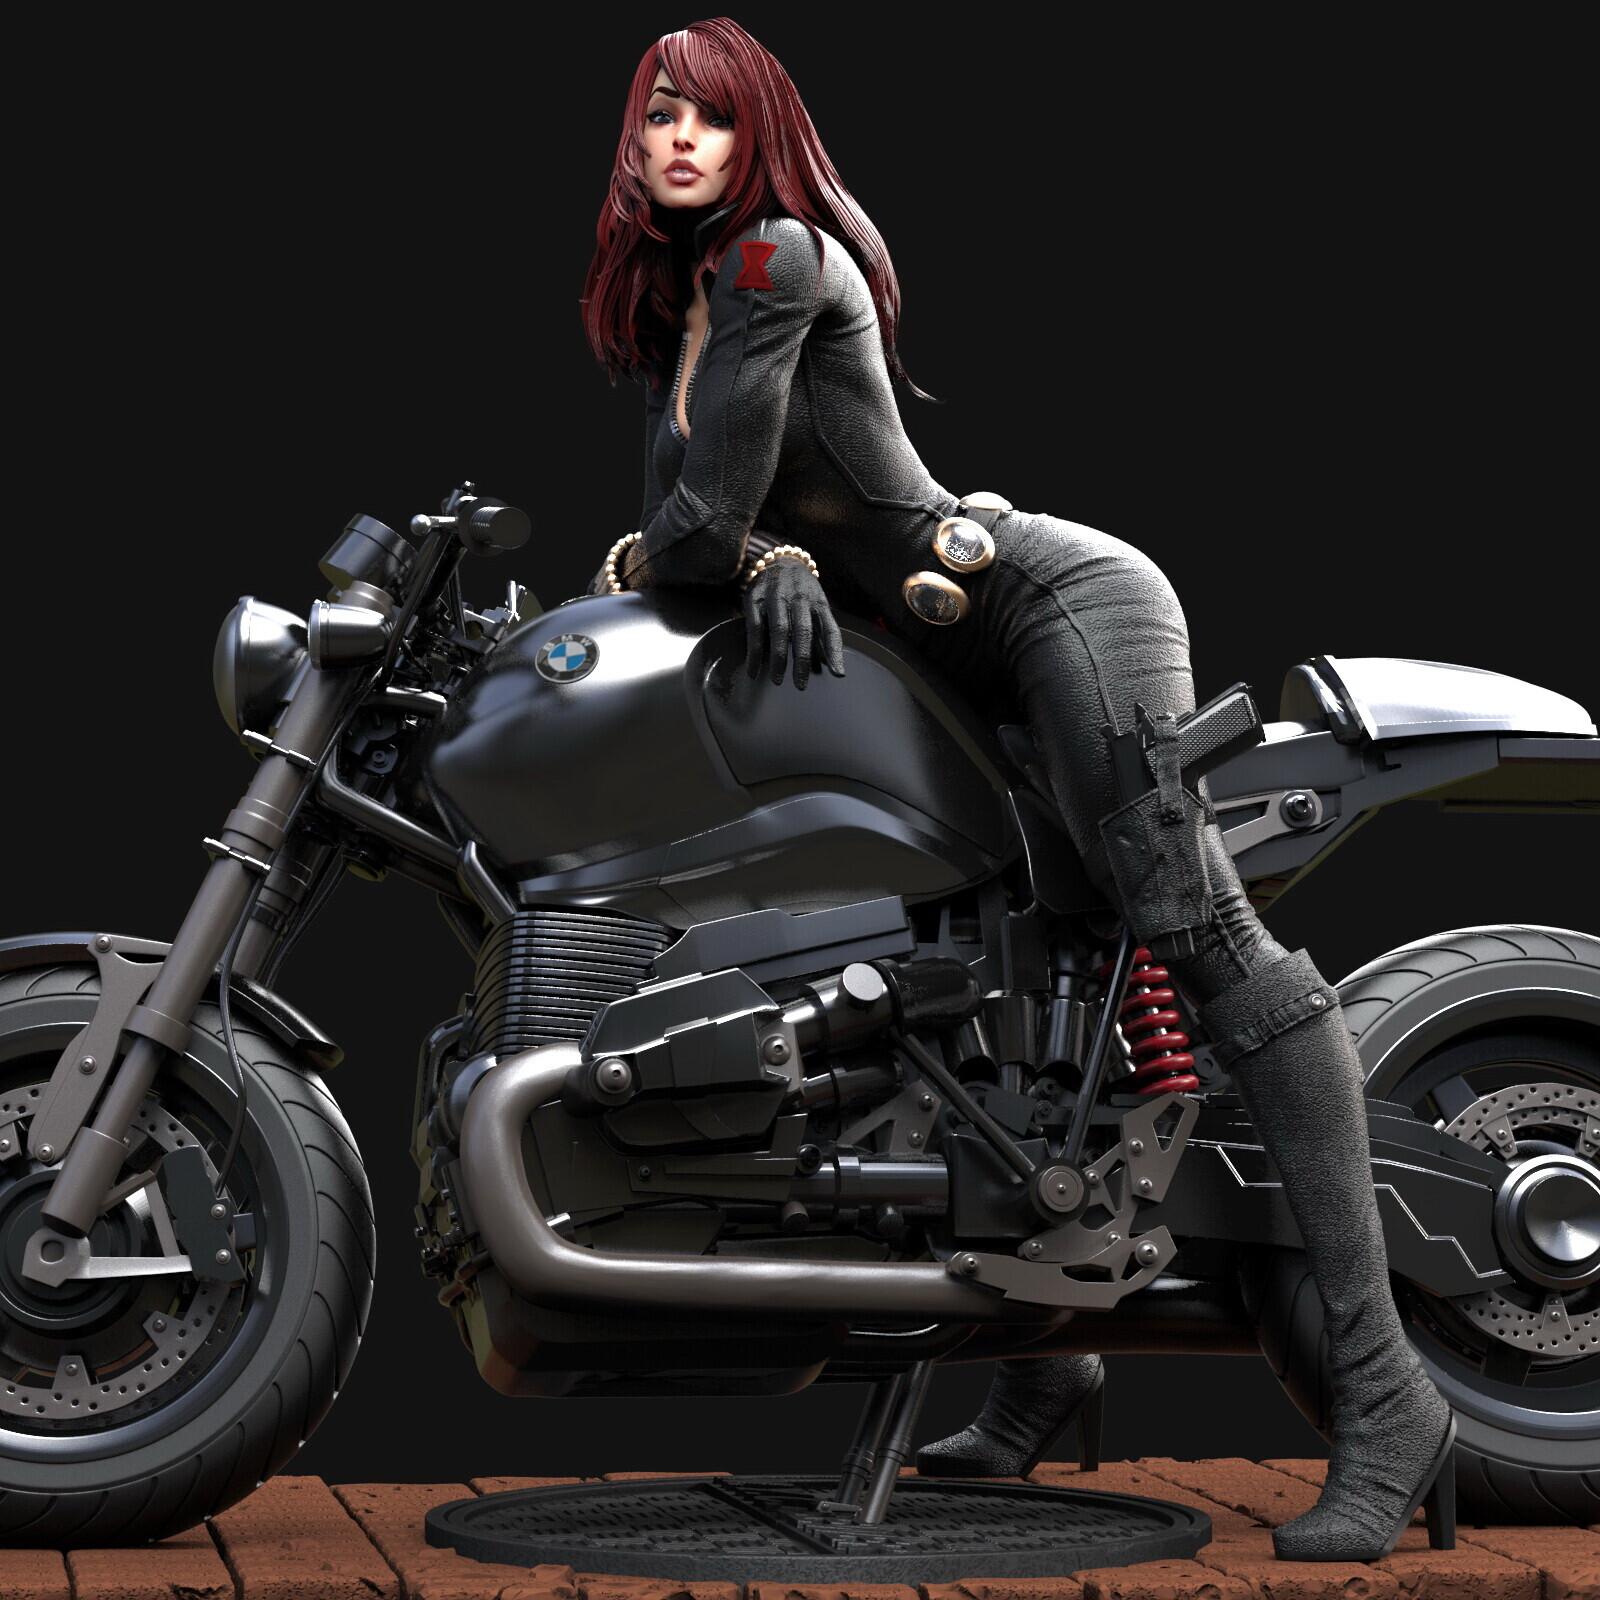 Black Widow BMW motorcycle